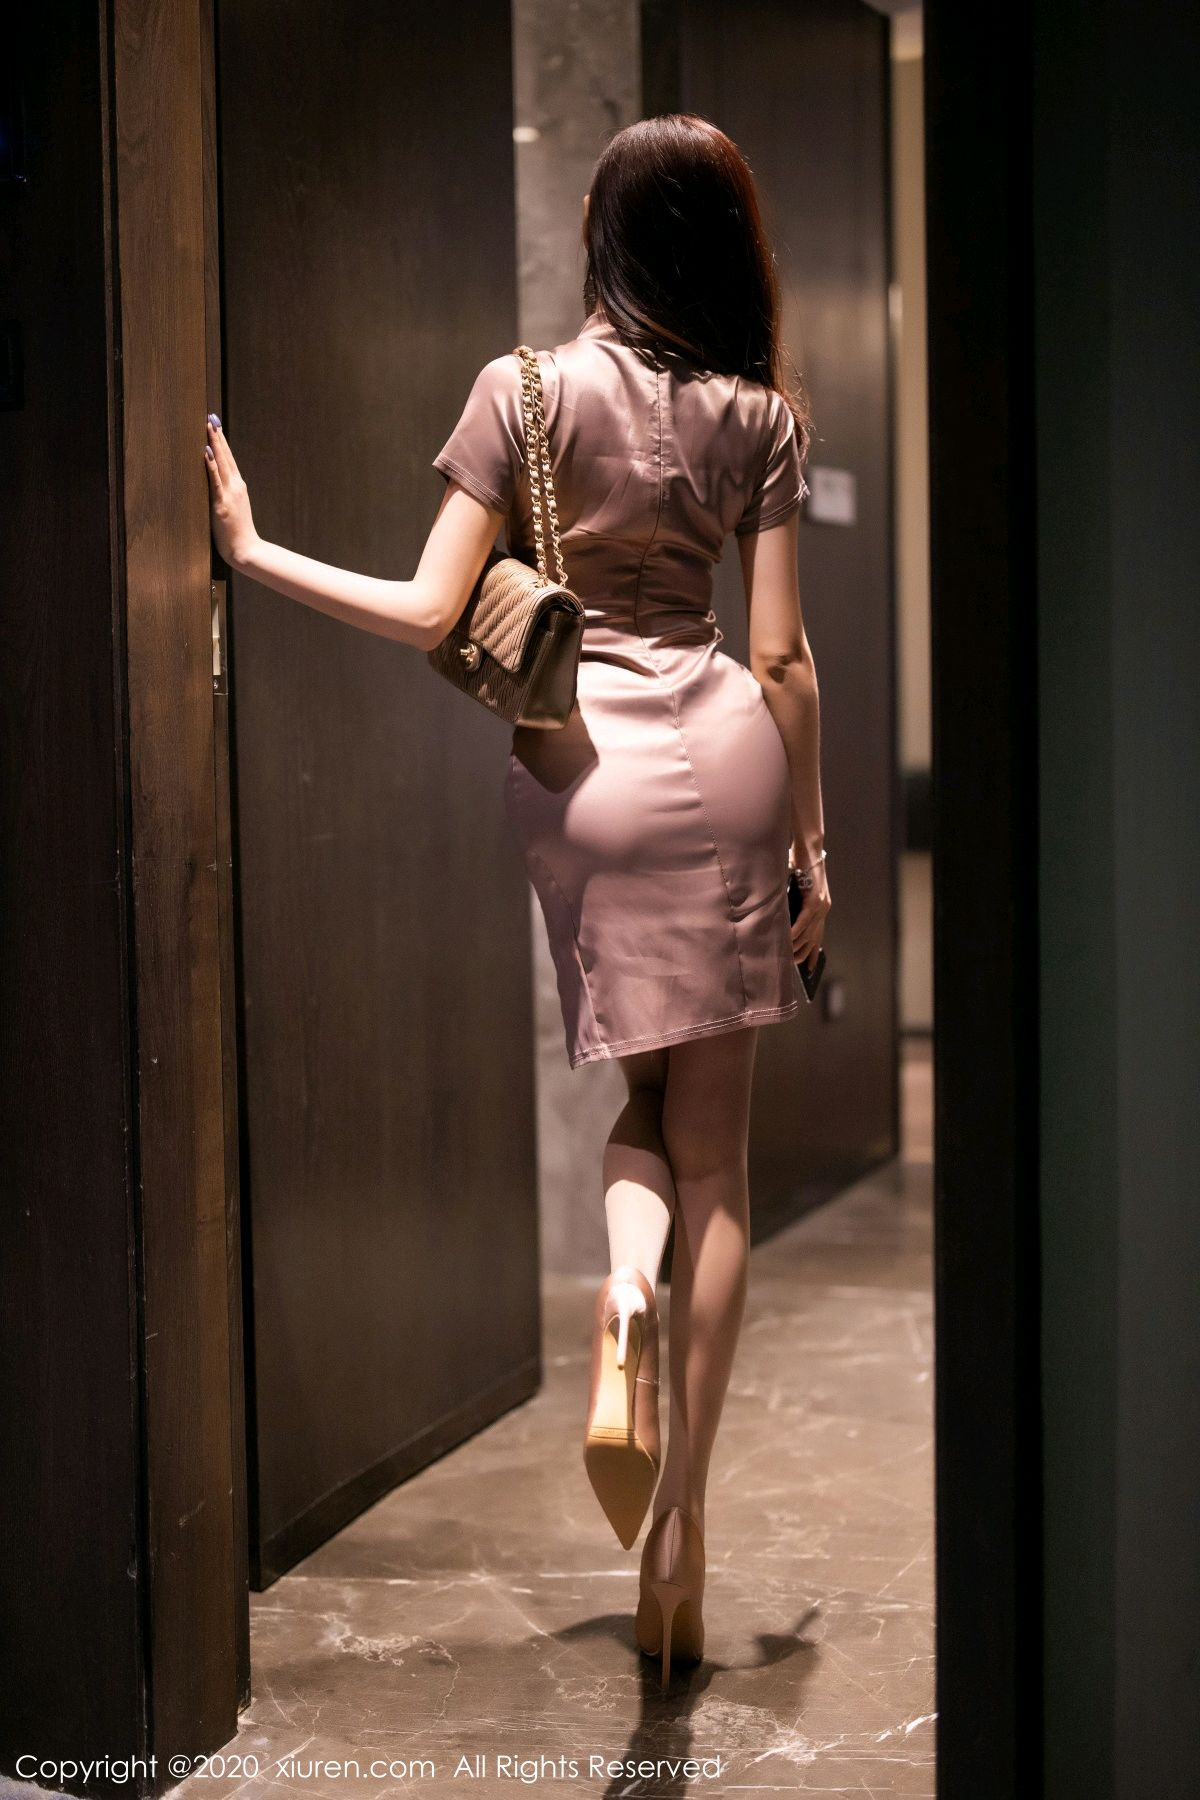 [XiuRen] Vol.2587 Yang Chen Chen 28P, Underwear, Xiuren, Yang Chen Chen